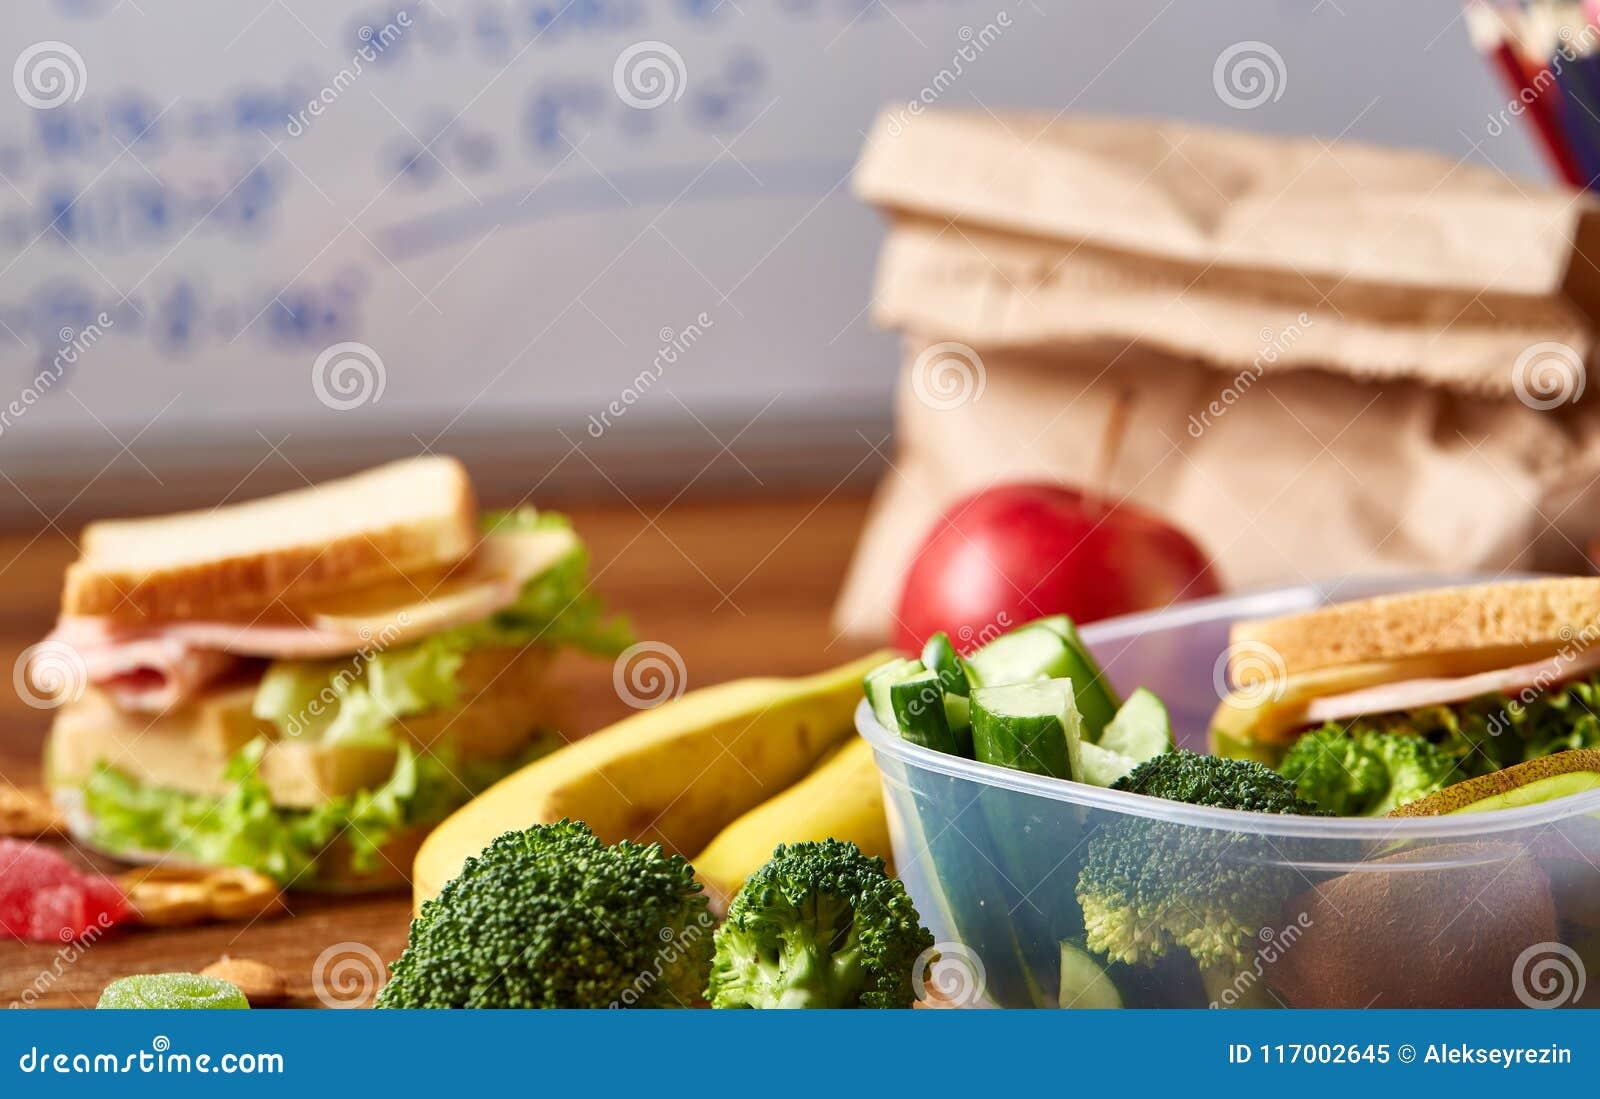 De volta ao conceito da escola, as fontes de escola, biscoitos, embalaram o almoço e a cesta de comida sobre o quadro branco, foc